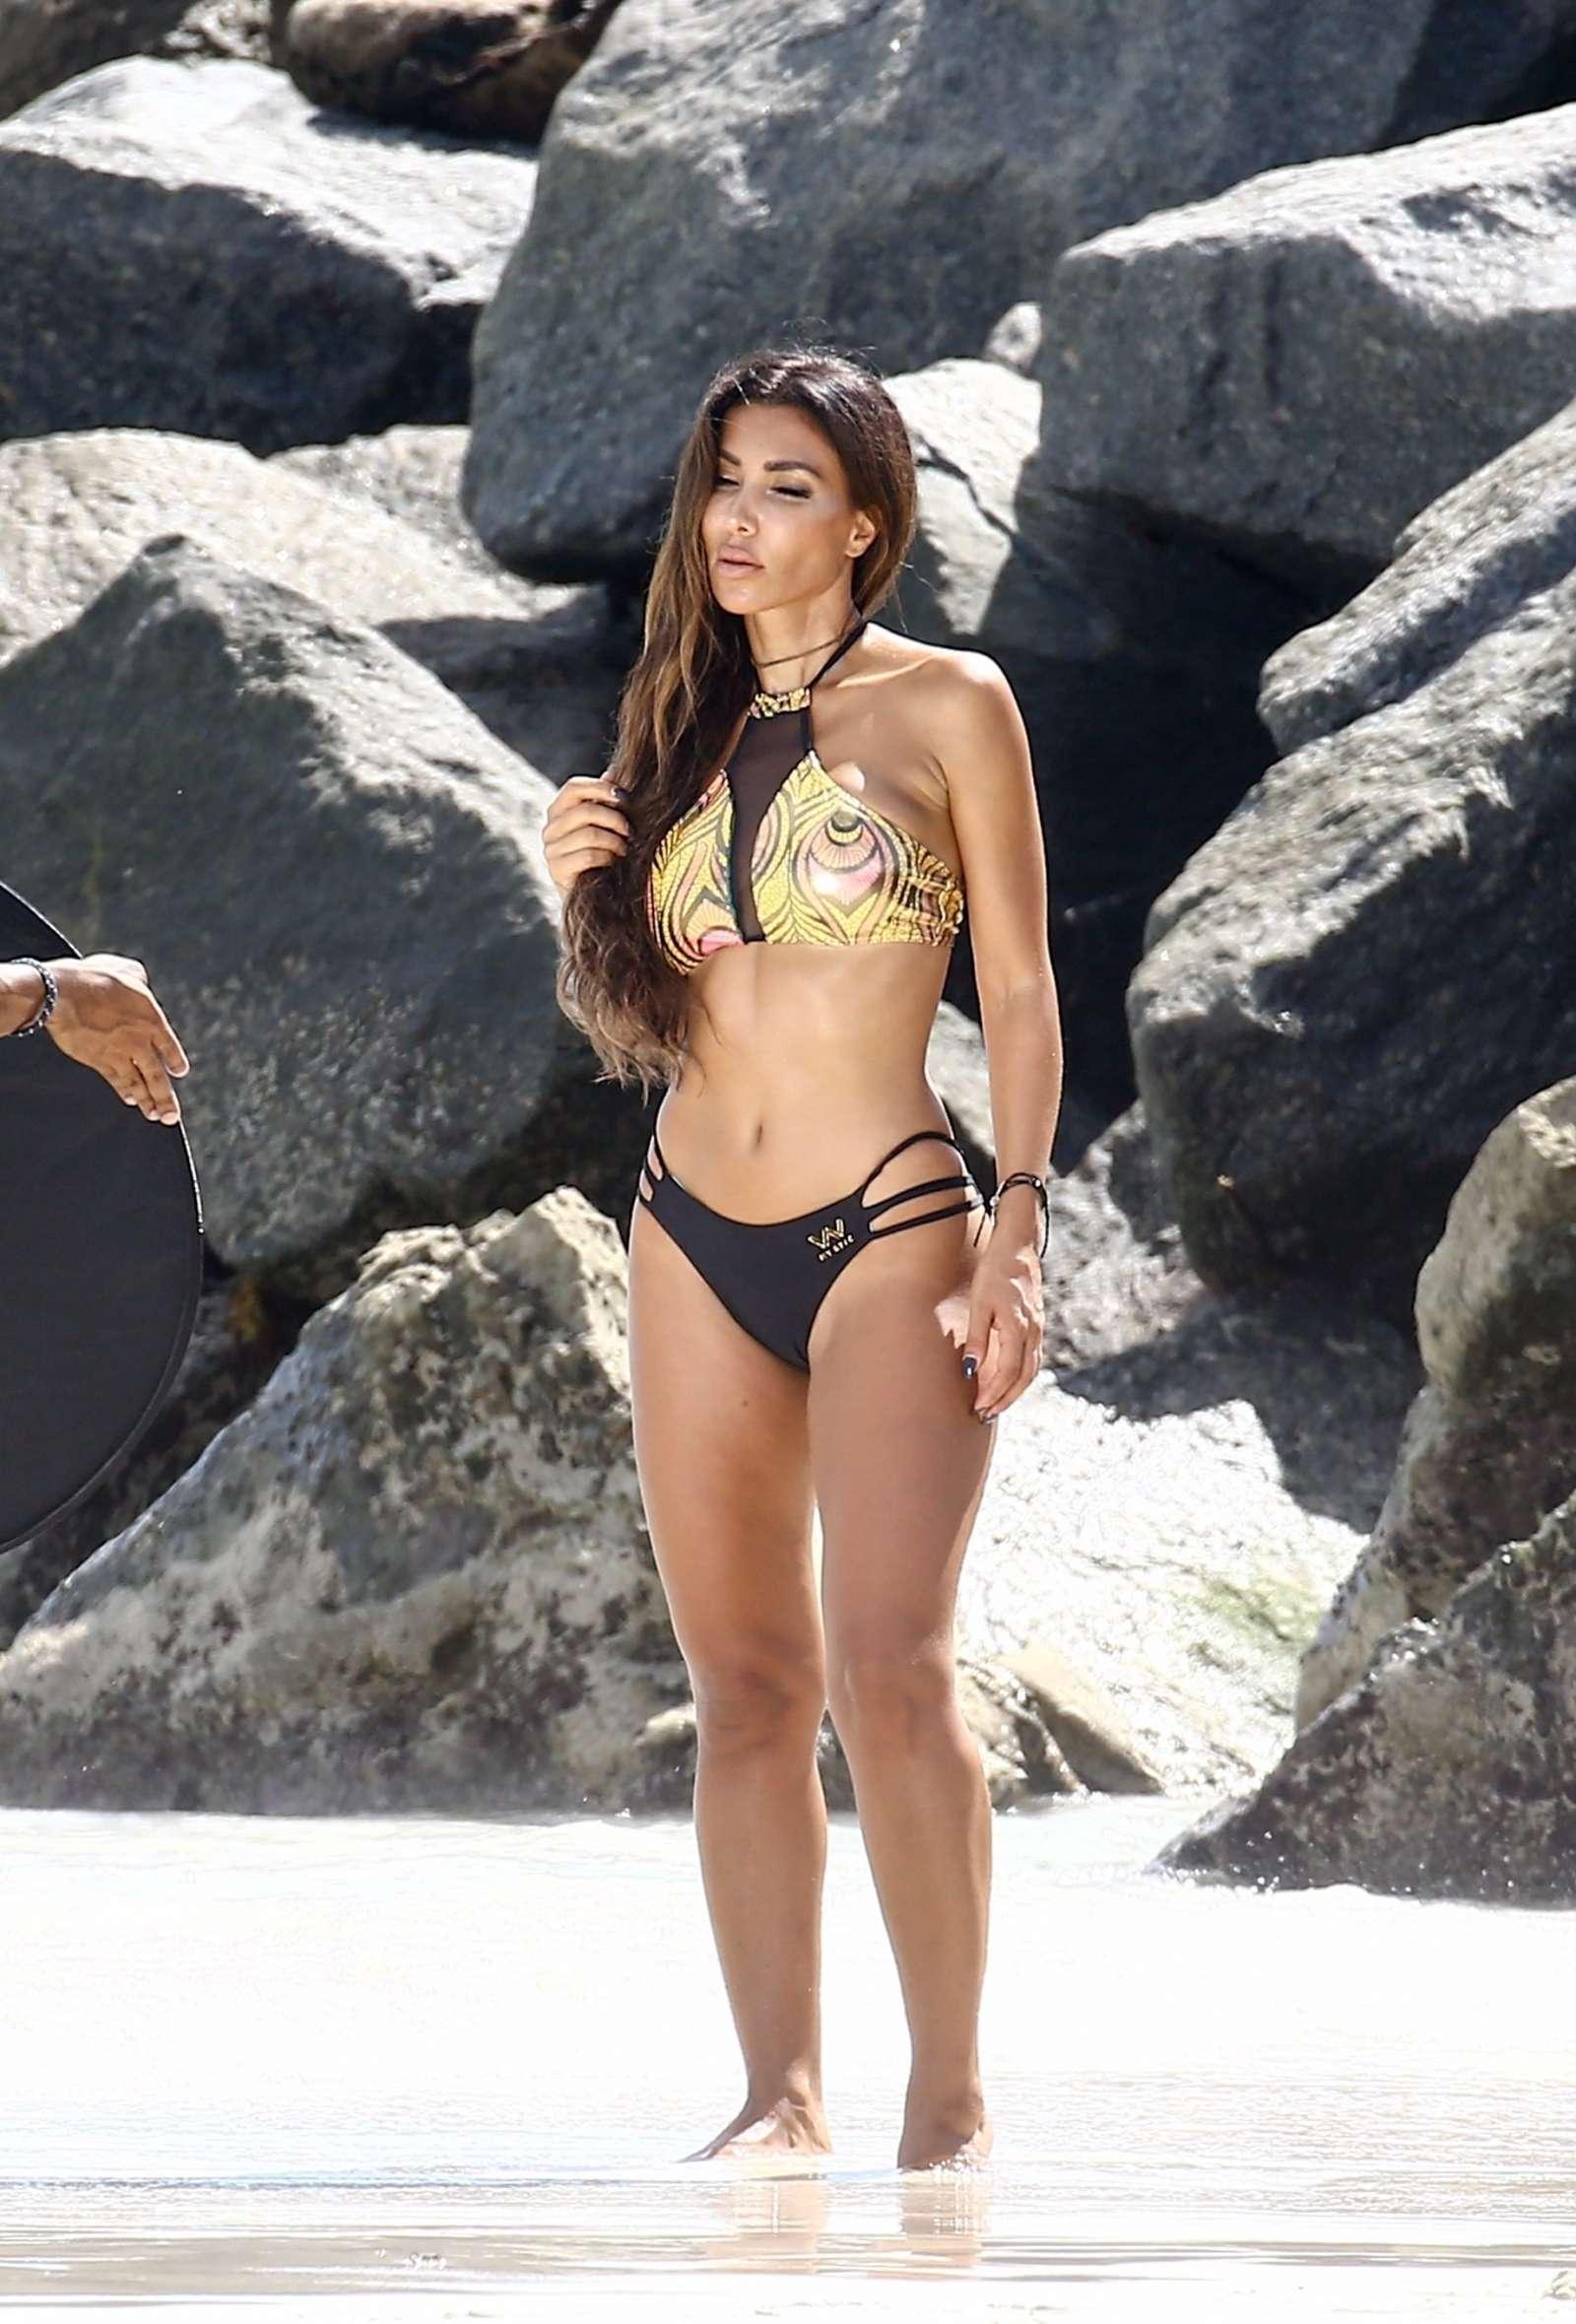 Metisha Schaefer Bikini Photoshoot on Miami Beach Pic 8 of 35